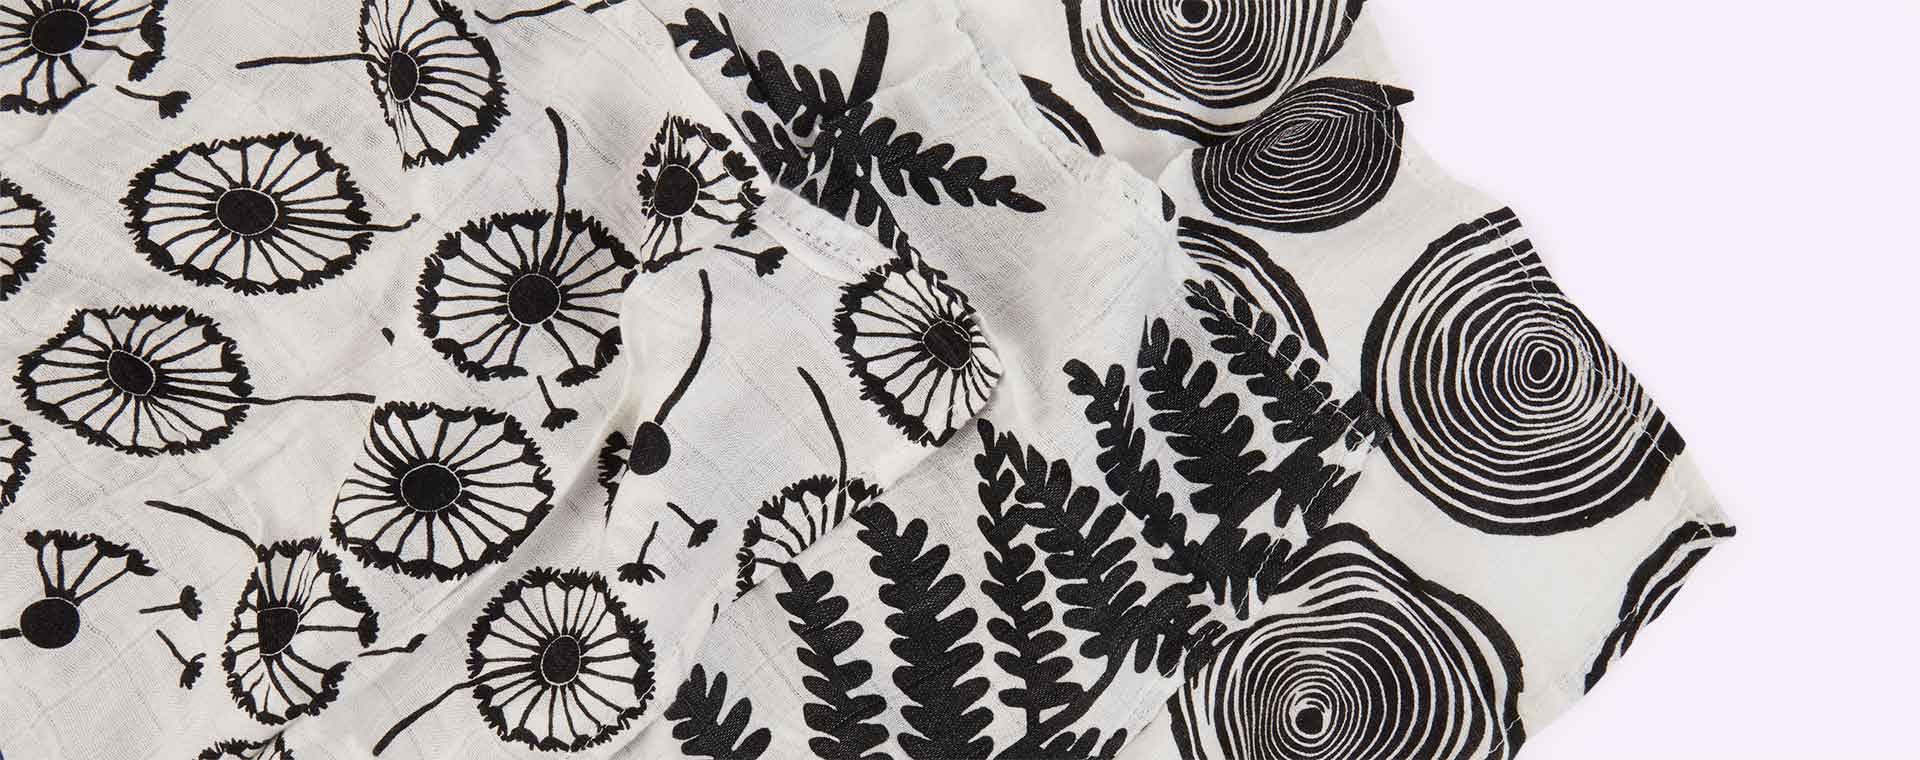 Plants Etta Loves Sensory Muslins - 3 Pack